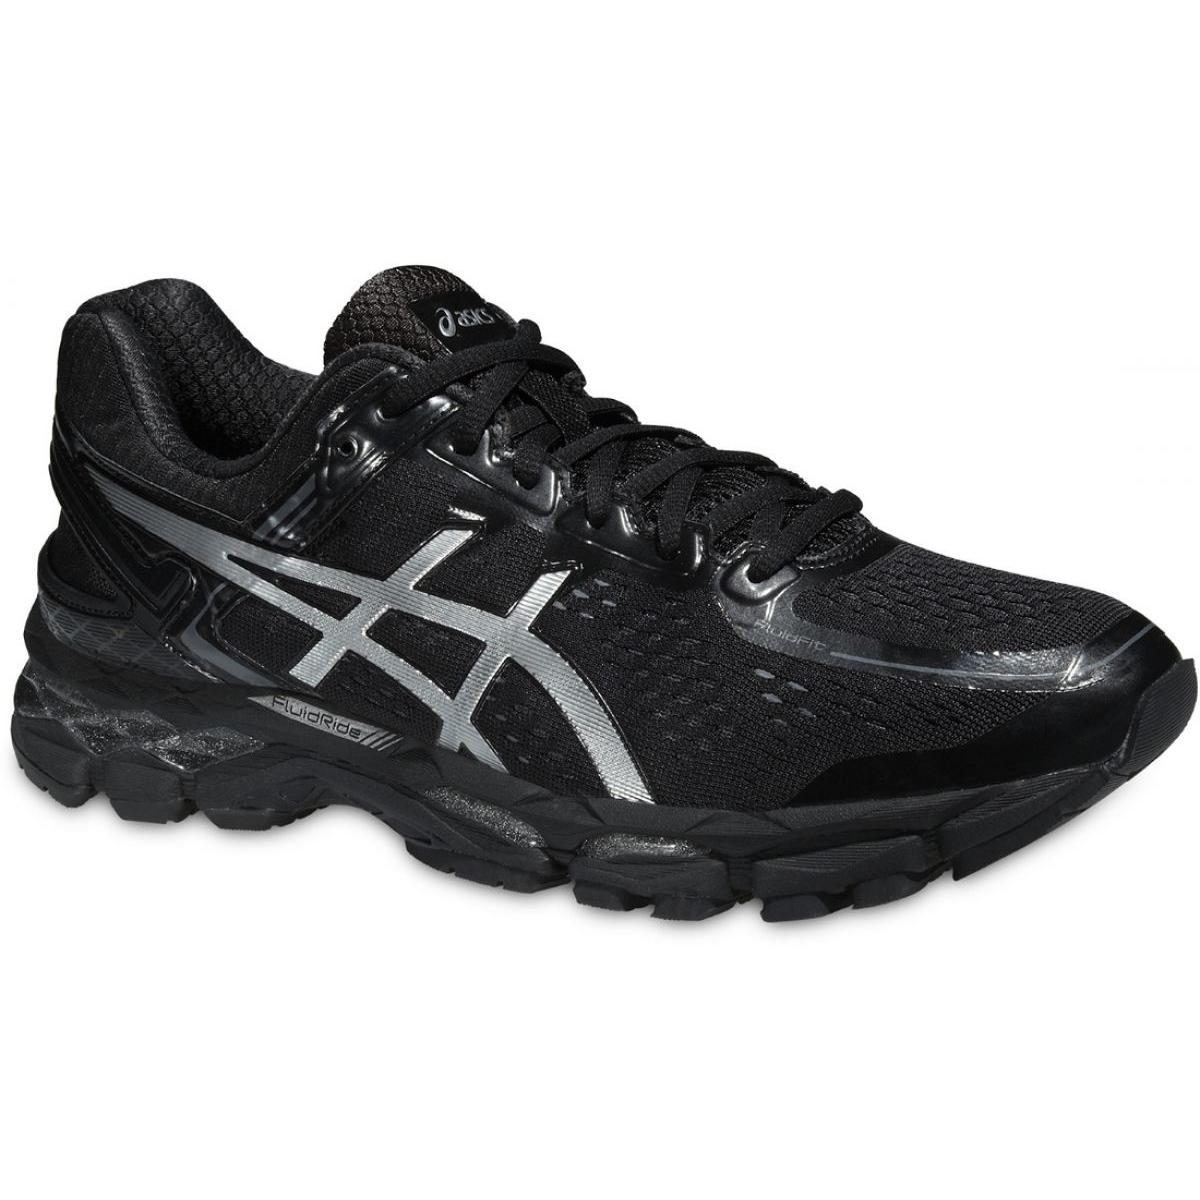 Noir Chaussures de course Asics Gel Kayano 22 M T547N 9993